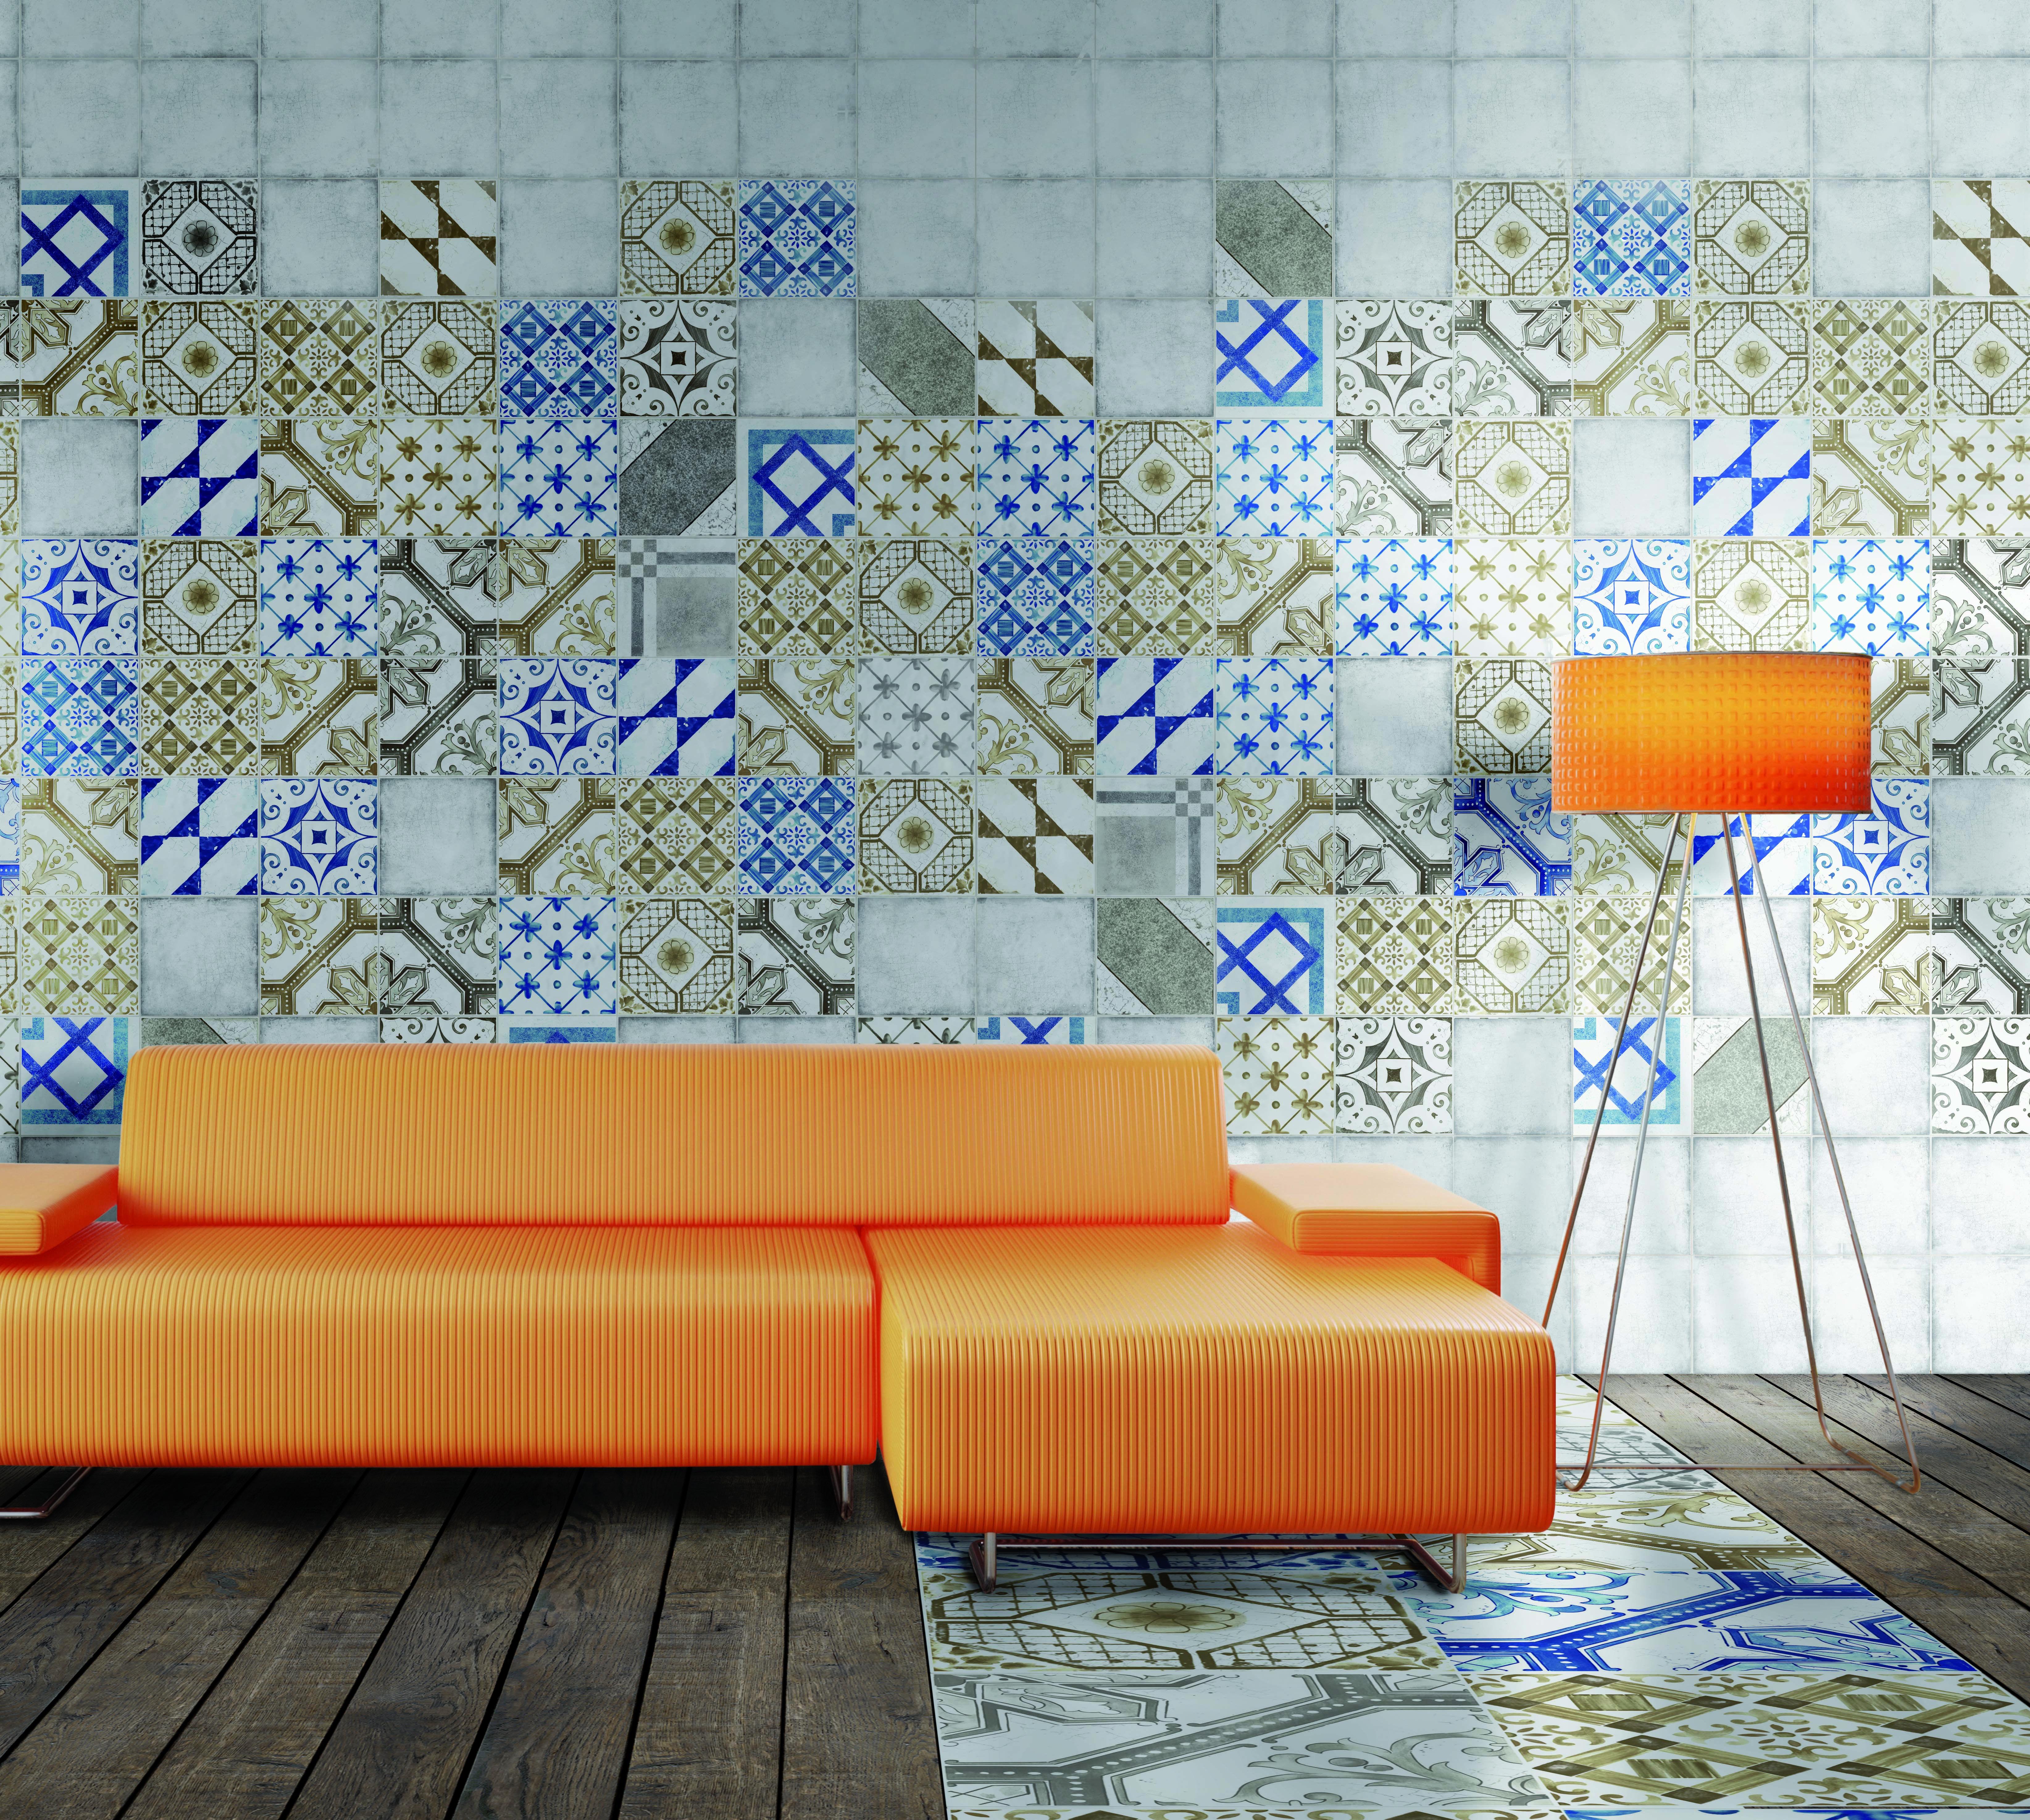 Palladio Blue, Brown Grey Mix from Mandarin Stone. http://www.mandarinstone.com/product/_/573/palladio-blue-mix/?cid=32 #bathroom #tile